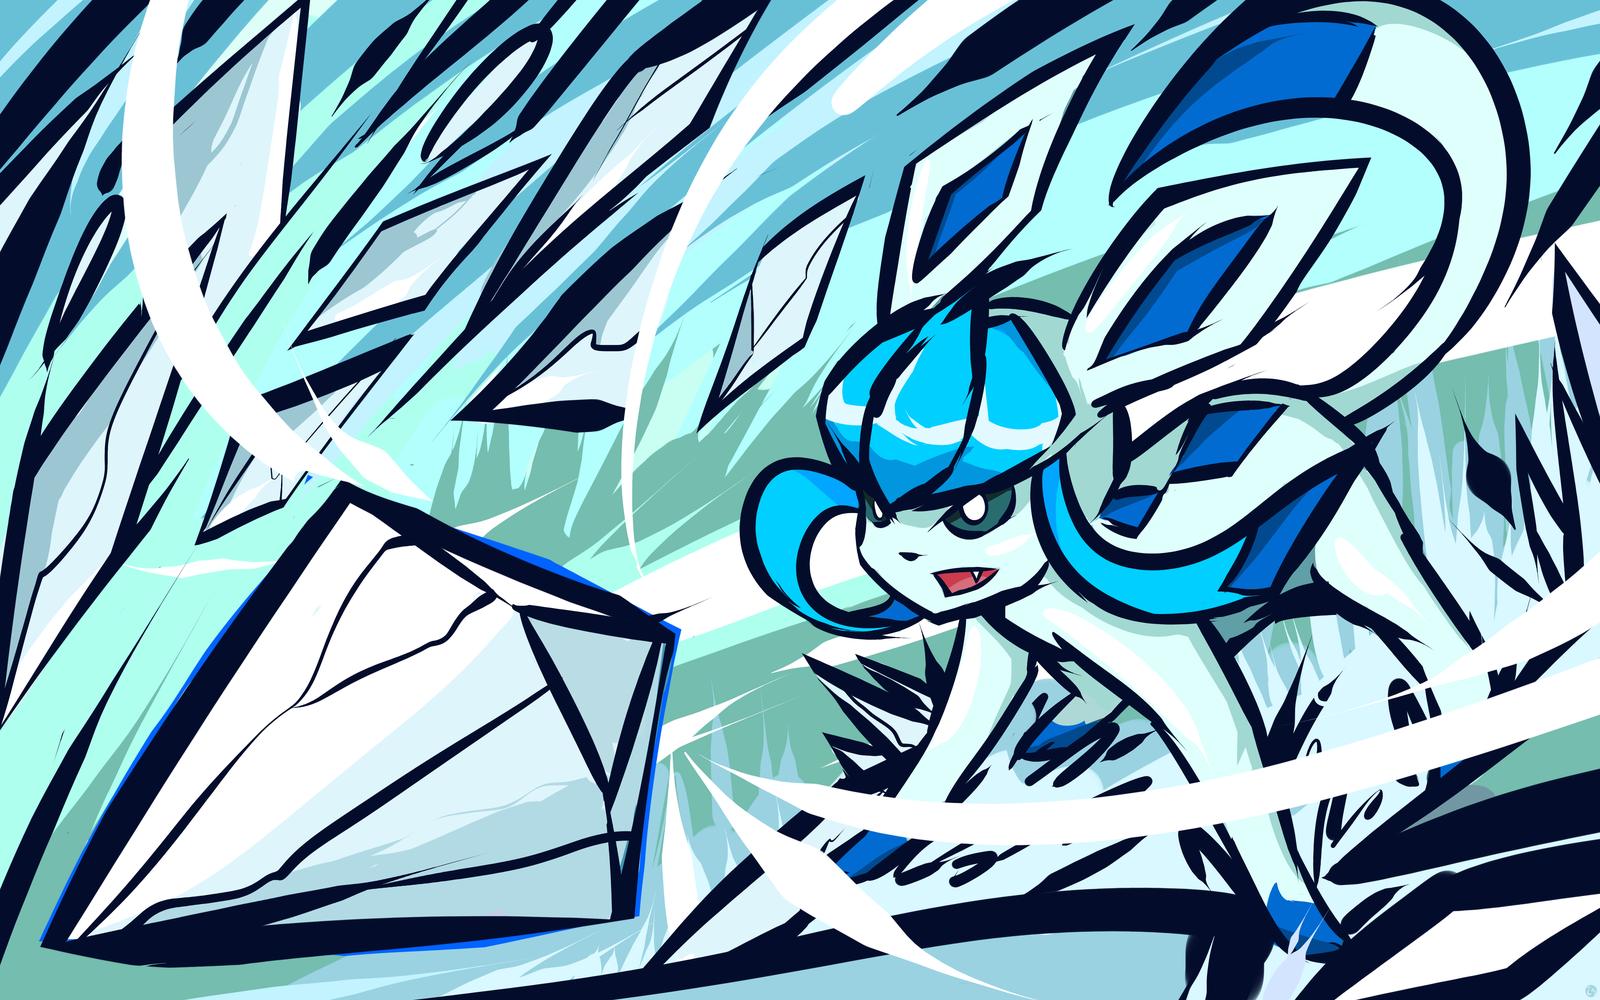 Shiny Glaceon Ice Shard Pokemon Cool Pokemon Pokemon Art